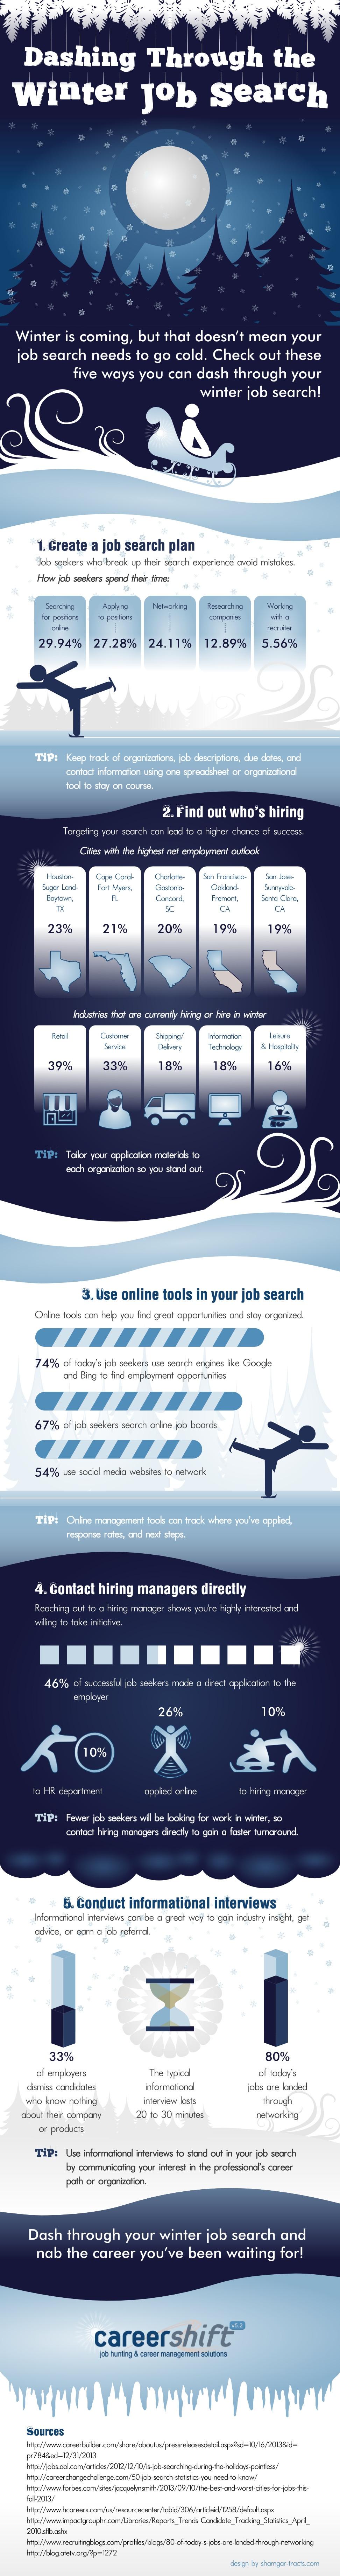 winter-job-search